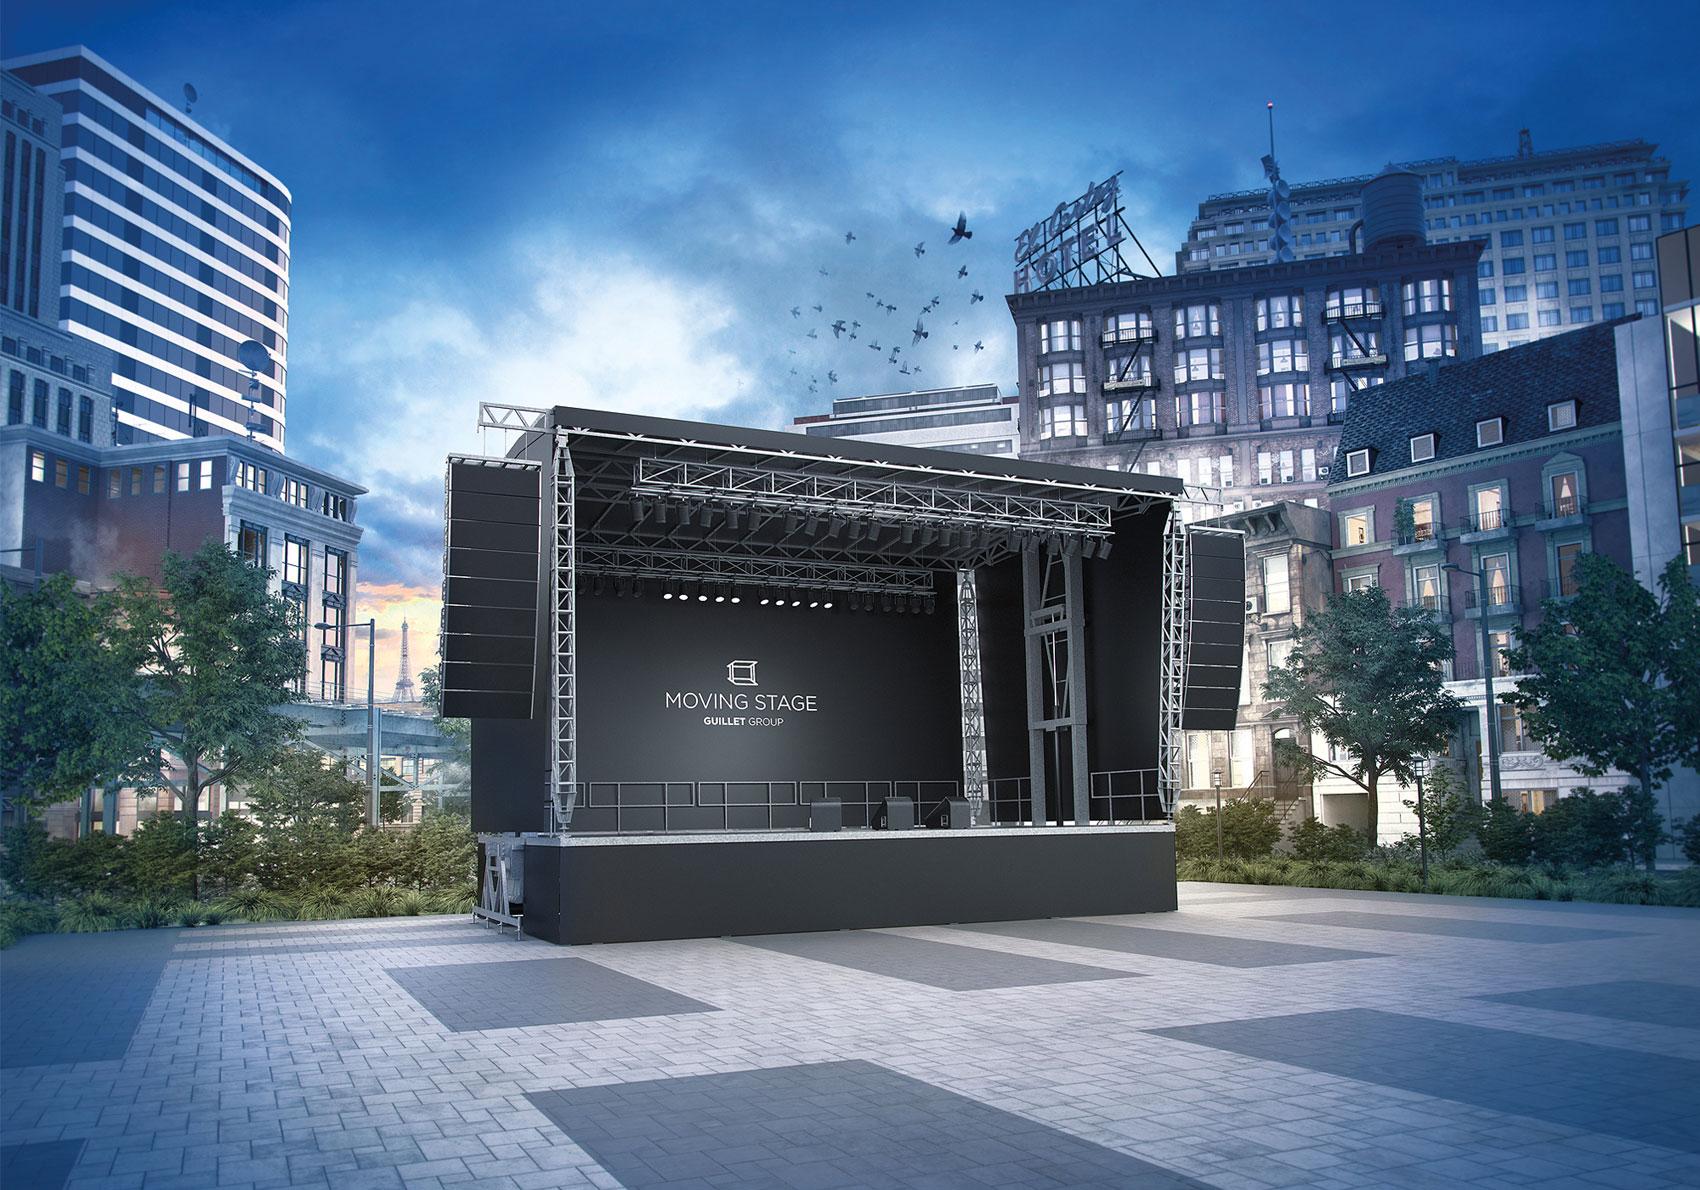 moving-stage-scene-mobile-guillet-3